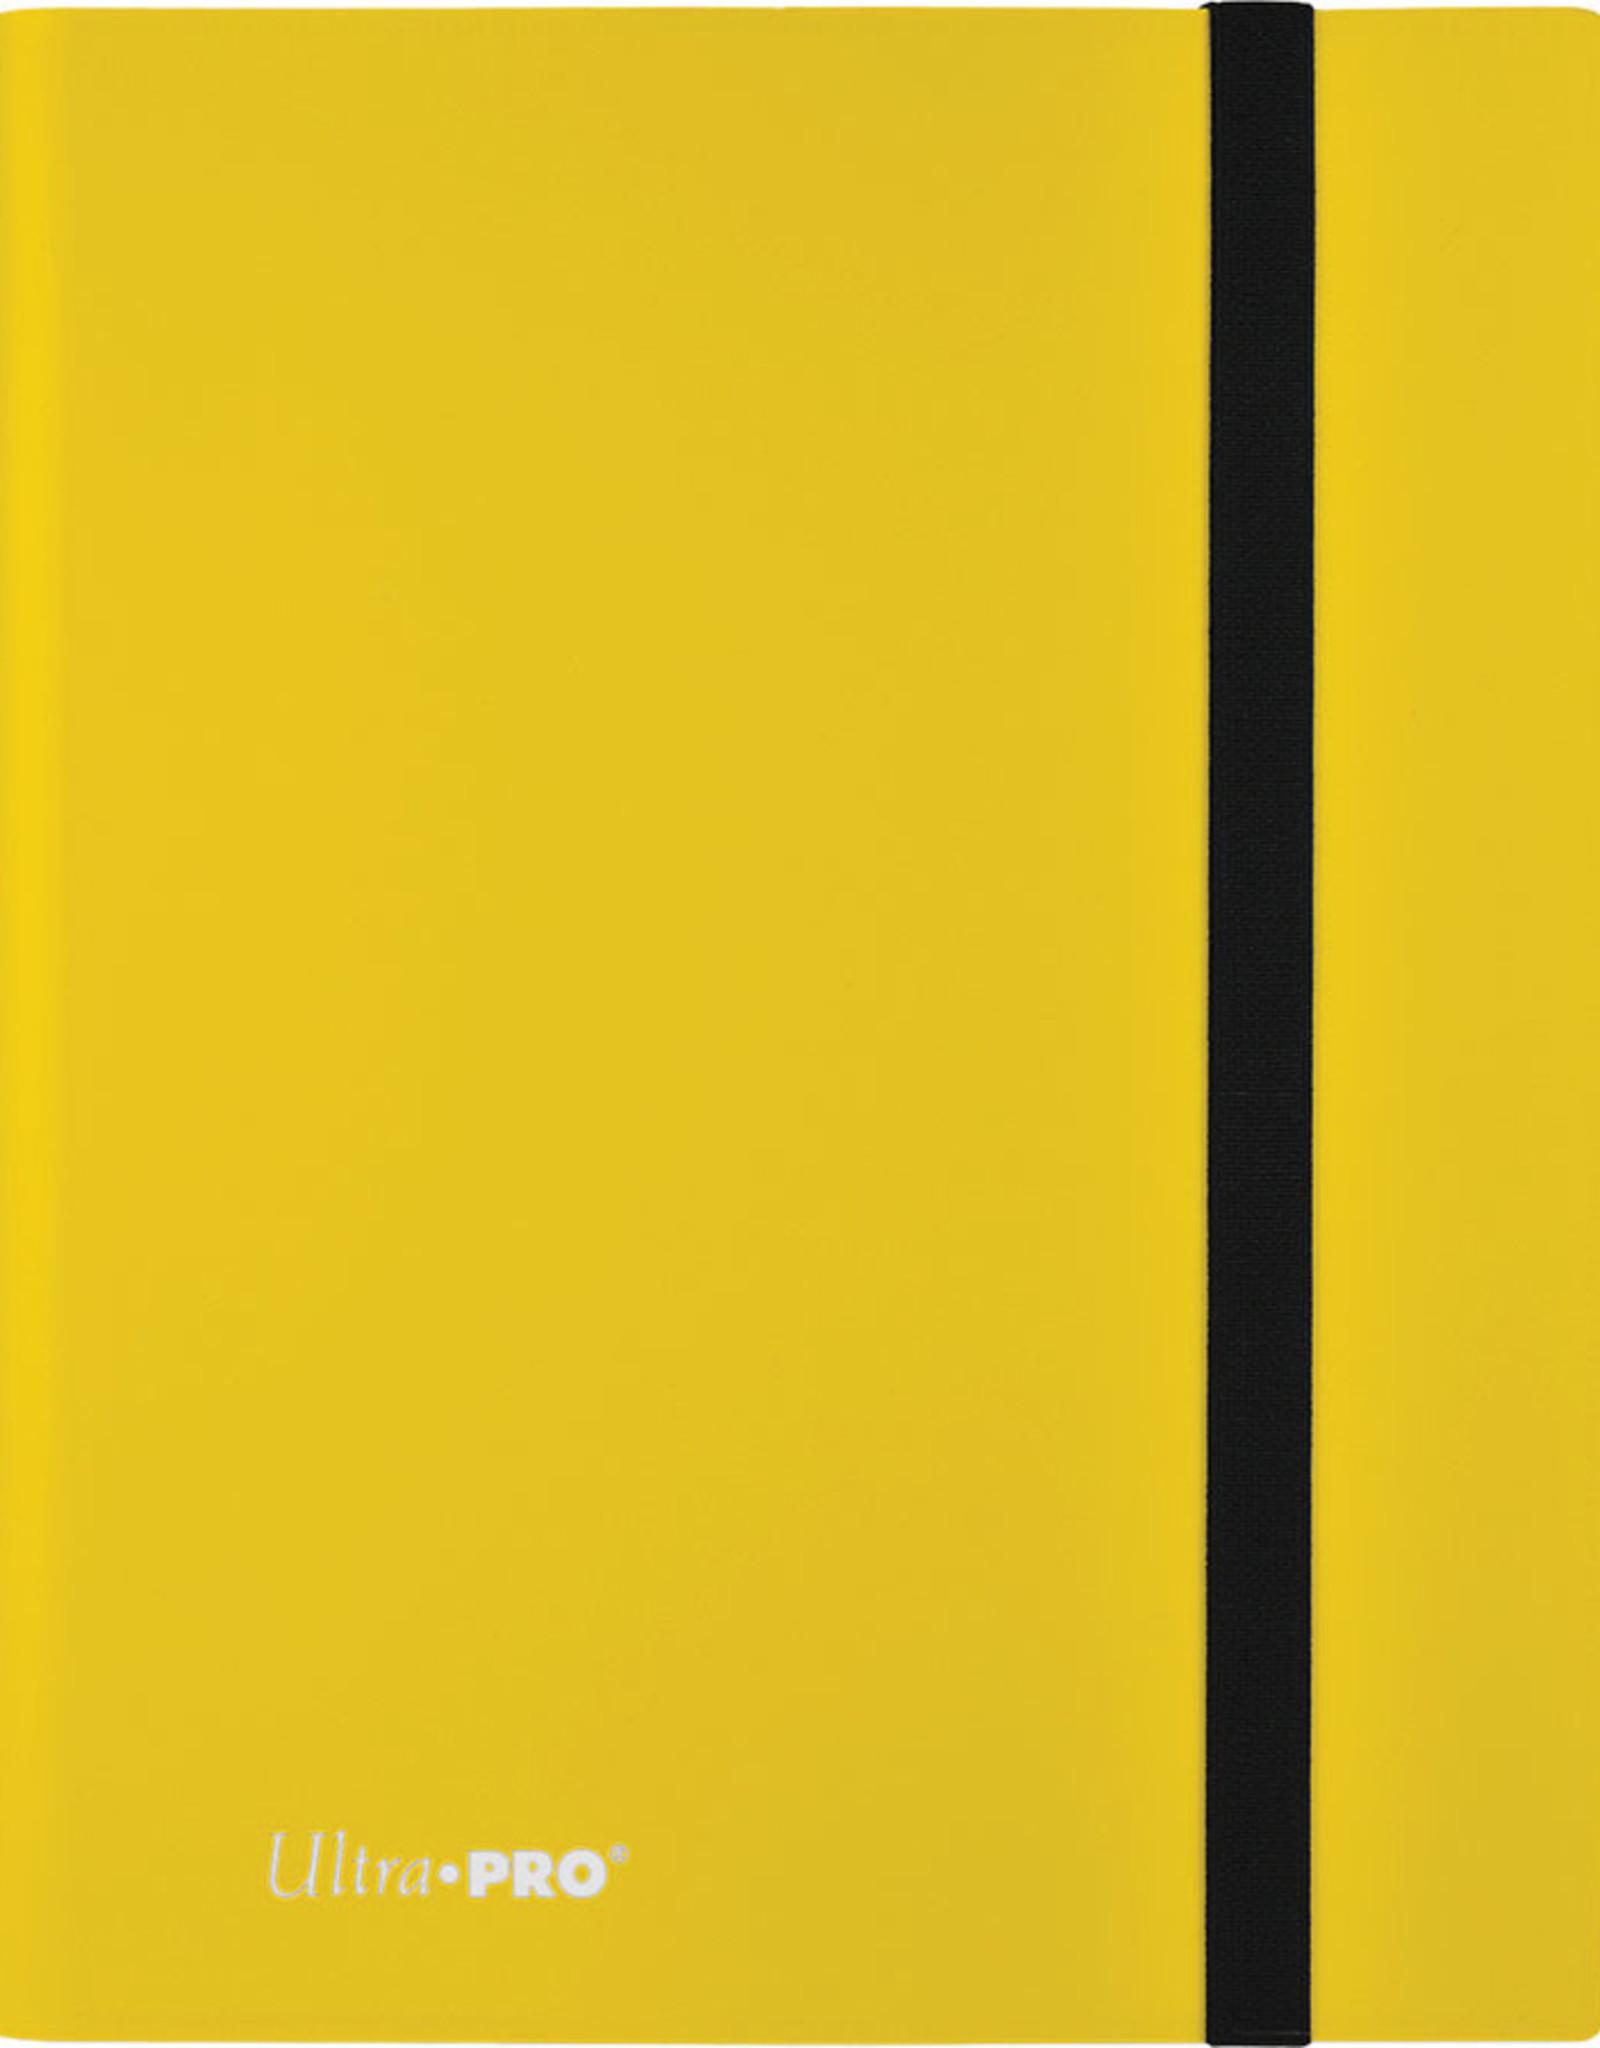 Ultra PRO Binder: Eclipse 9pkt Lemon Yellow